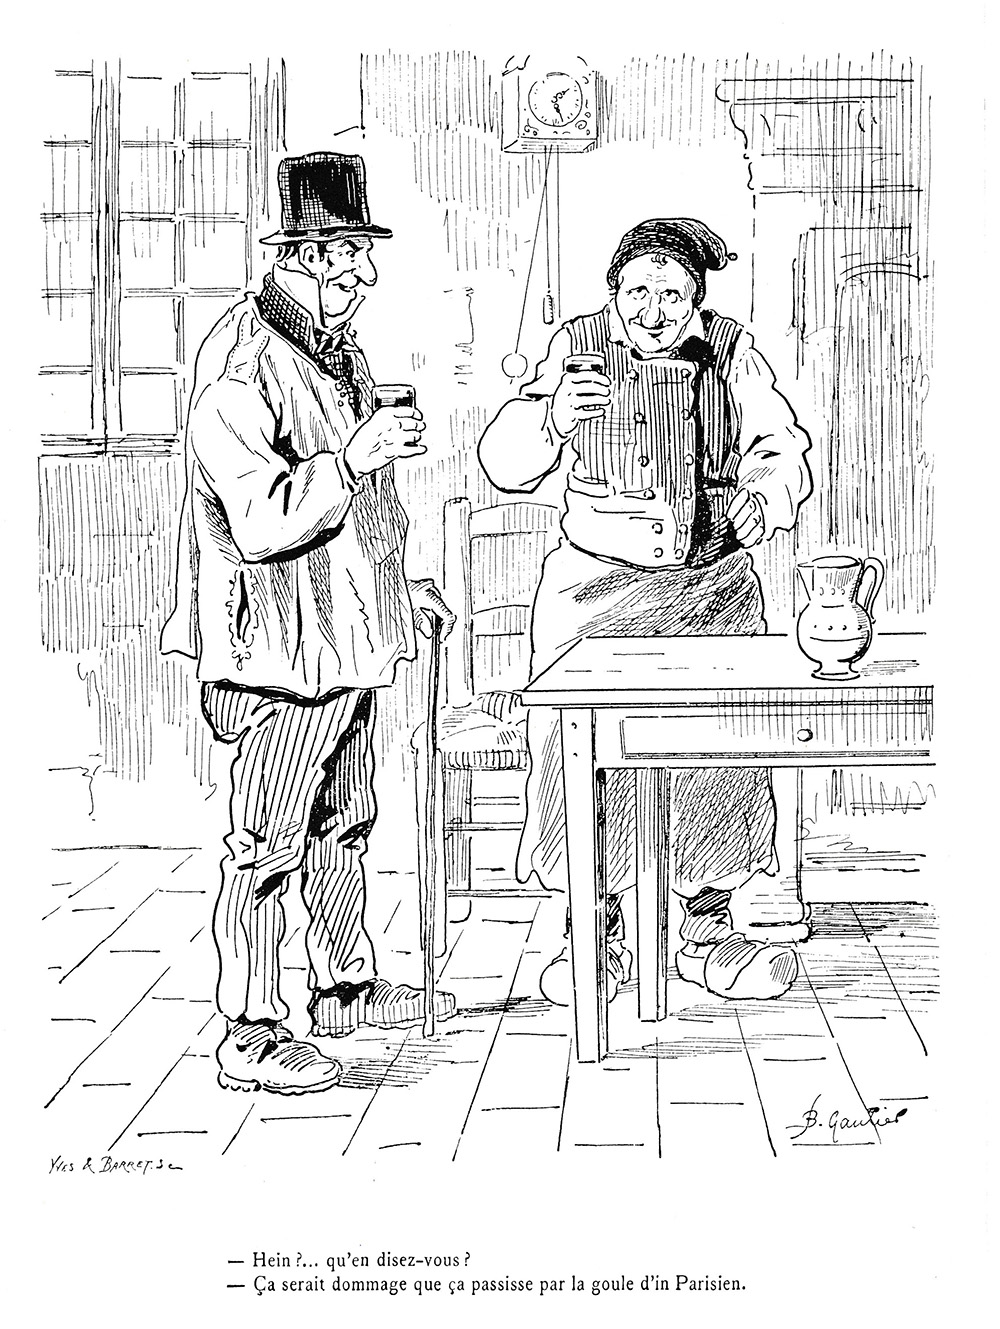 Pons - Un dessin de Barthélémy Gautier